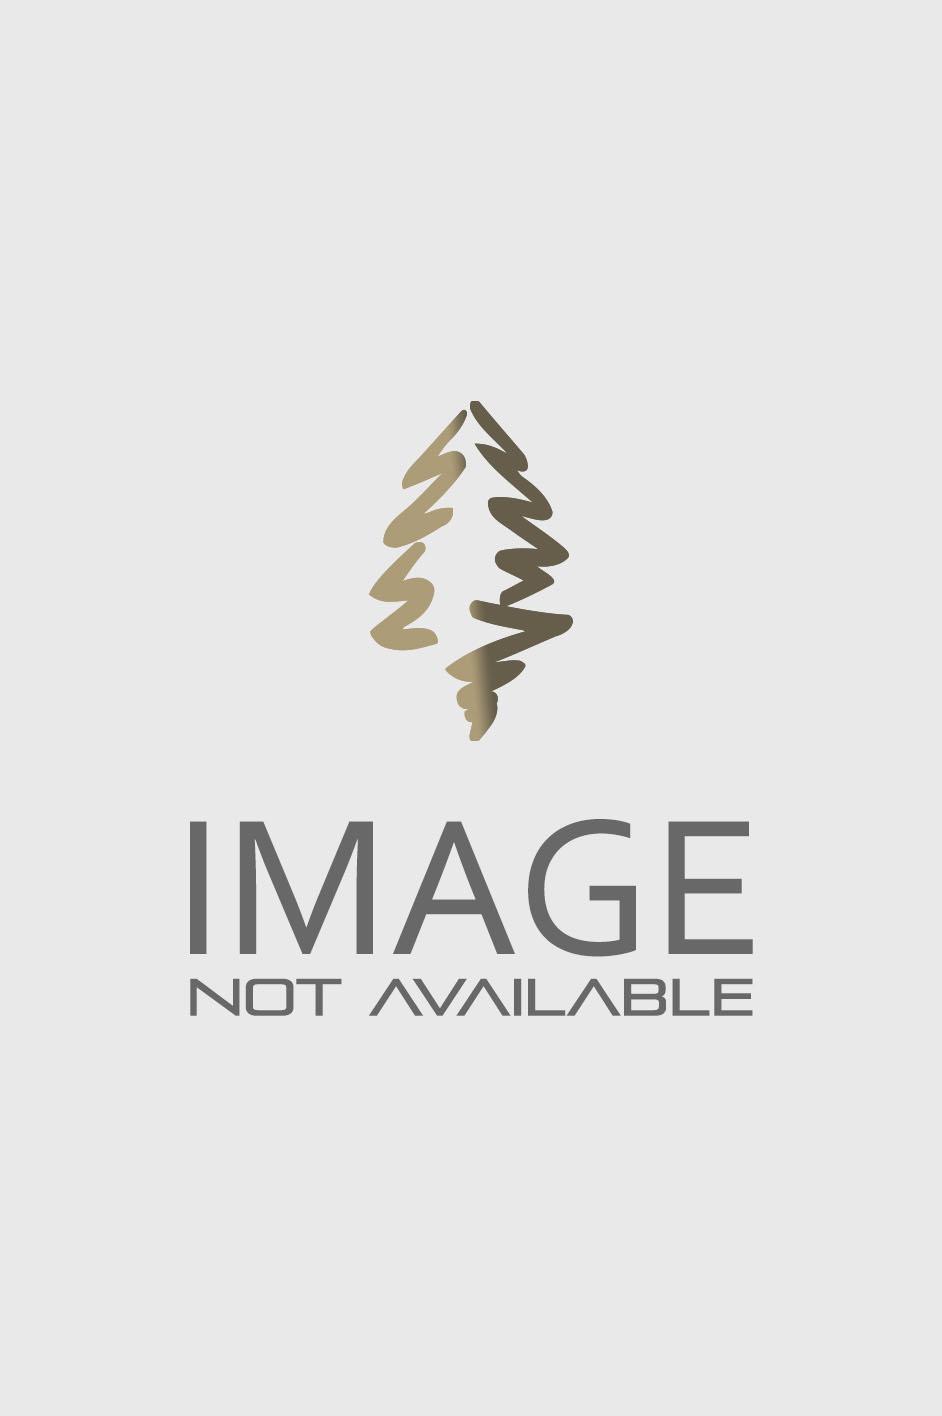 MAPLE BLAIR SILVER For Sale in Boulder Colorado